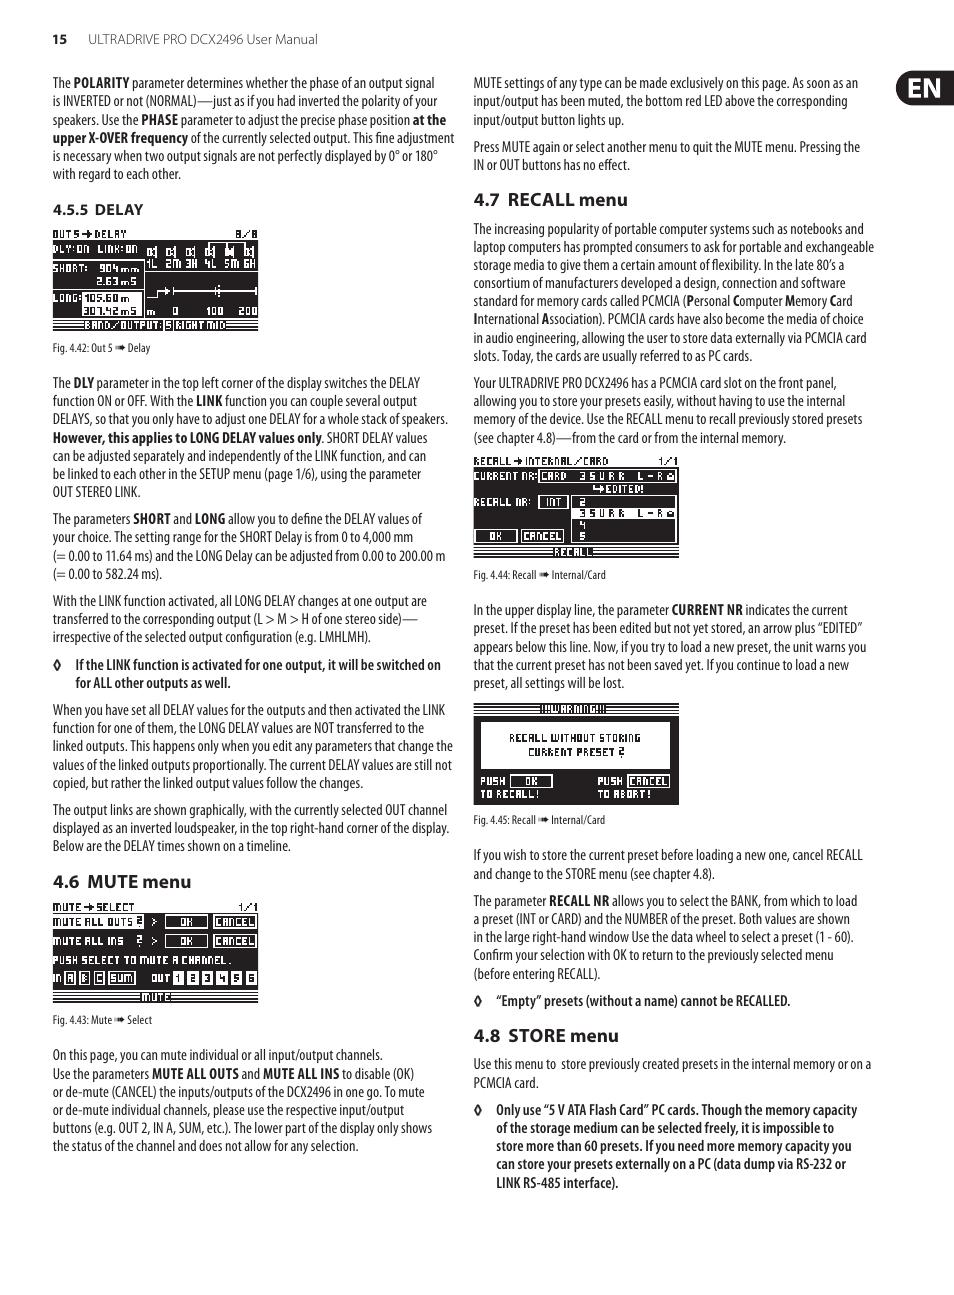 behringer ultradrive pro dcx2496 user manual page 15 35 rh manualsdir com Behringer DriveRack Behringer DriveRack